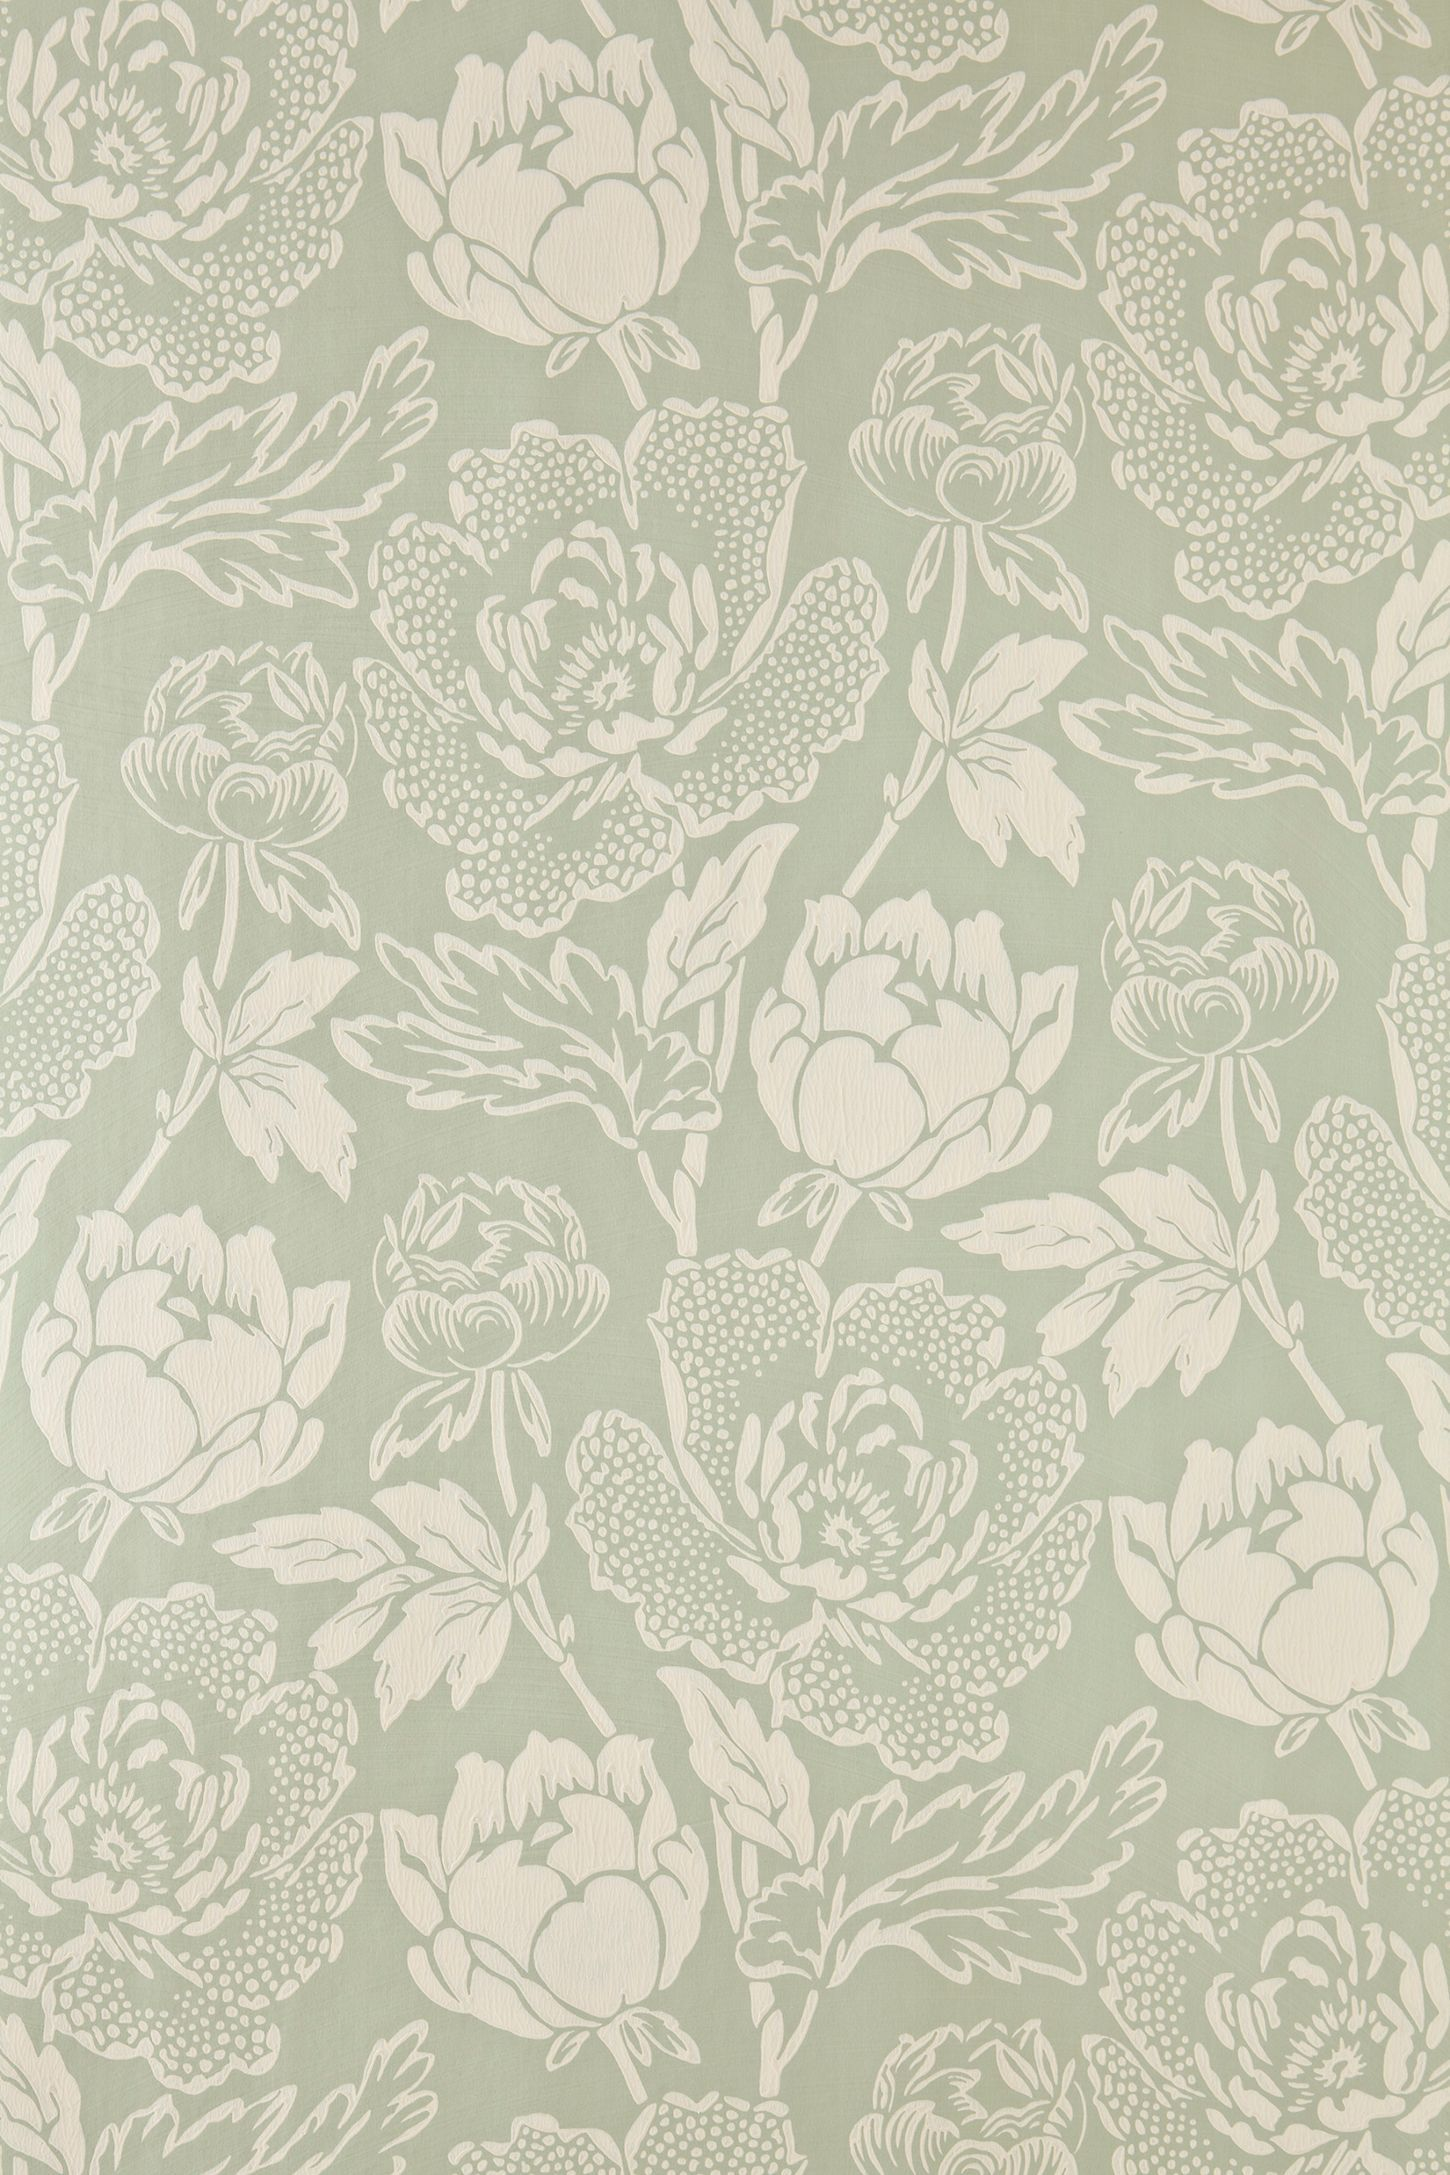 Farrow & Ball Peony Wallpaper Green wallpaper, Wallpaper